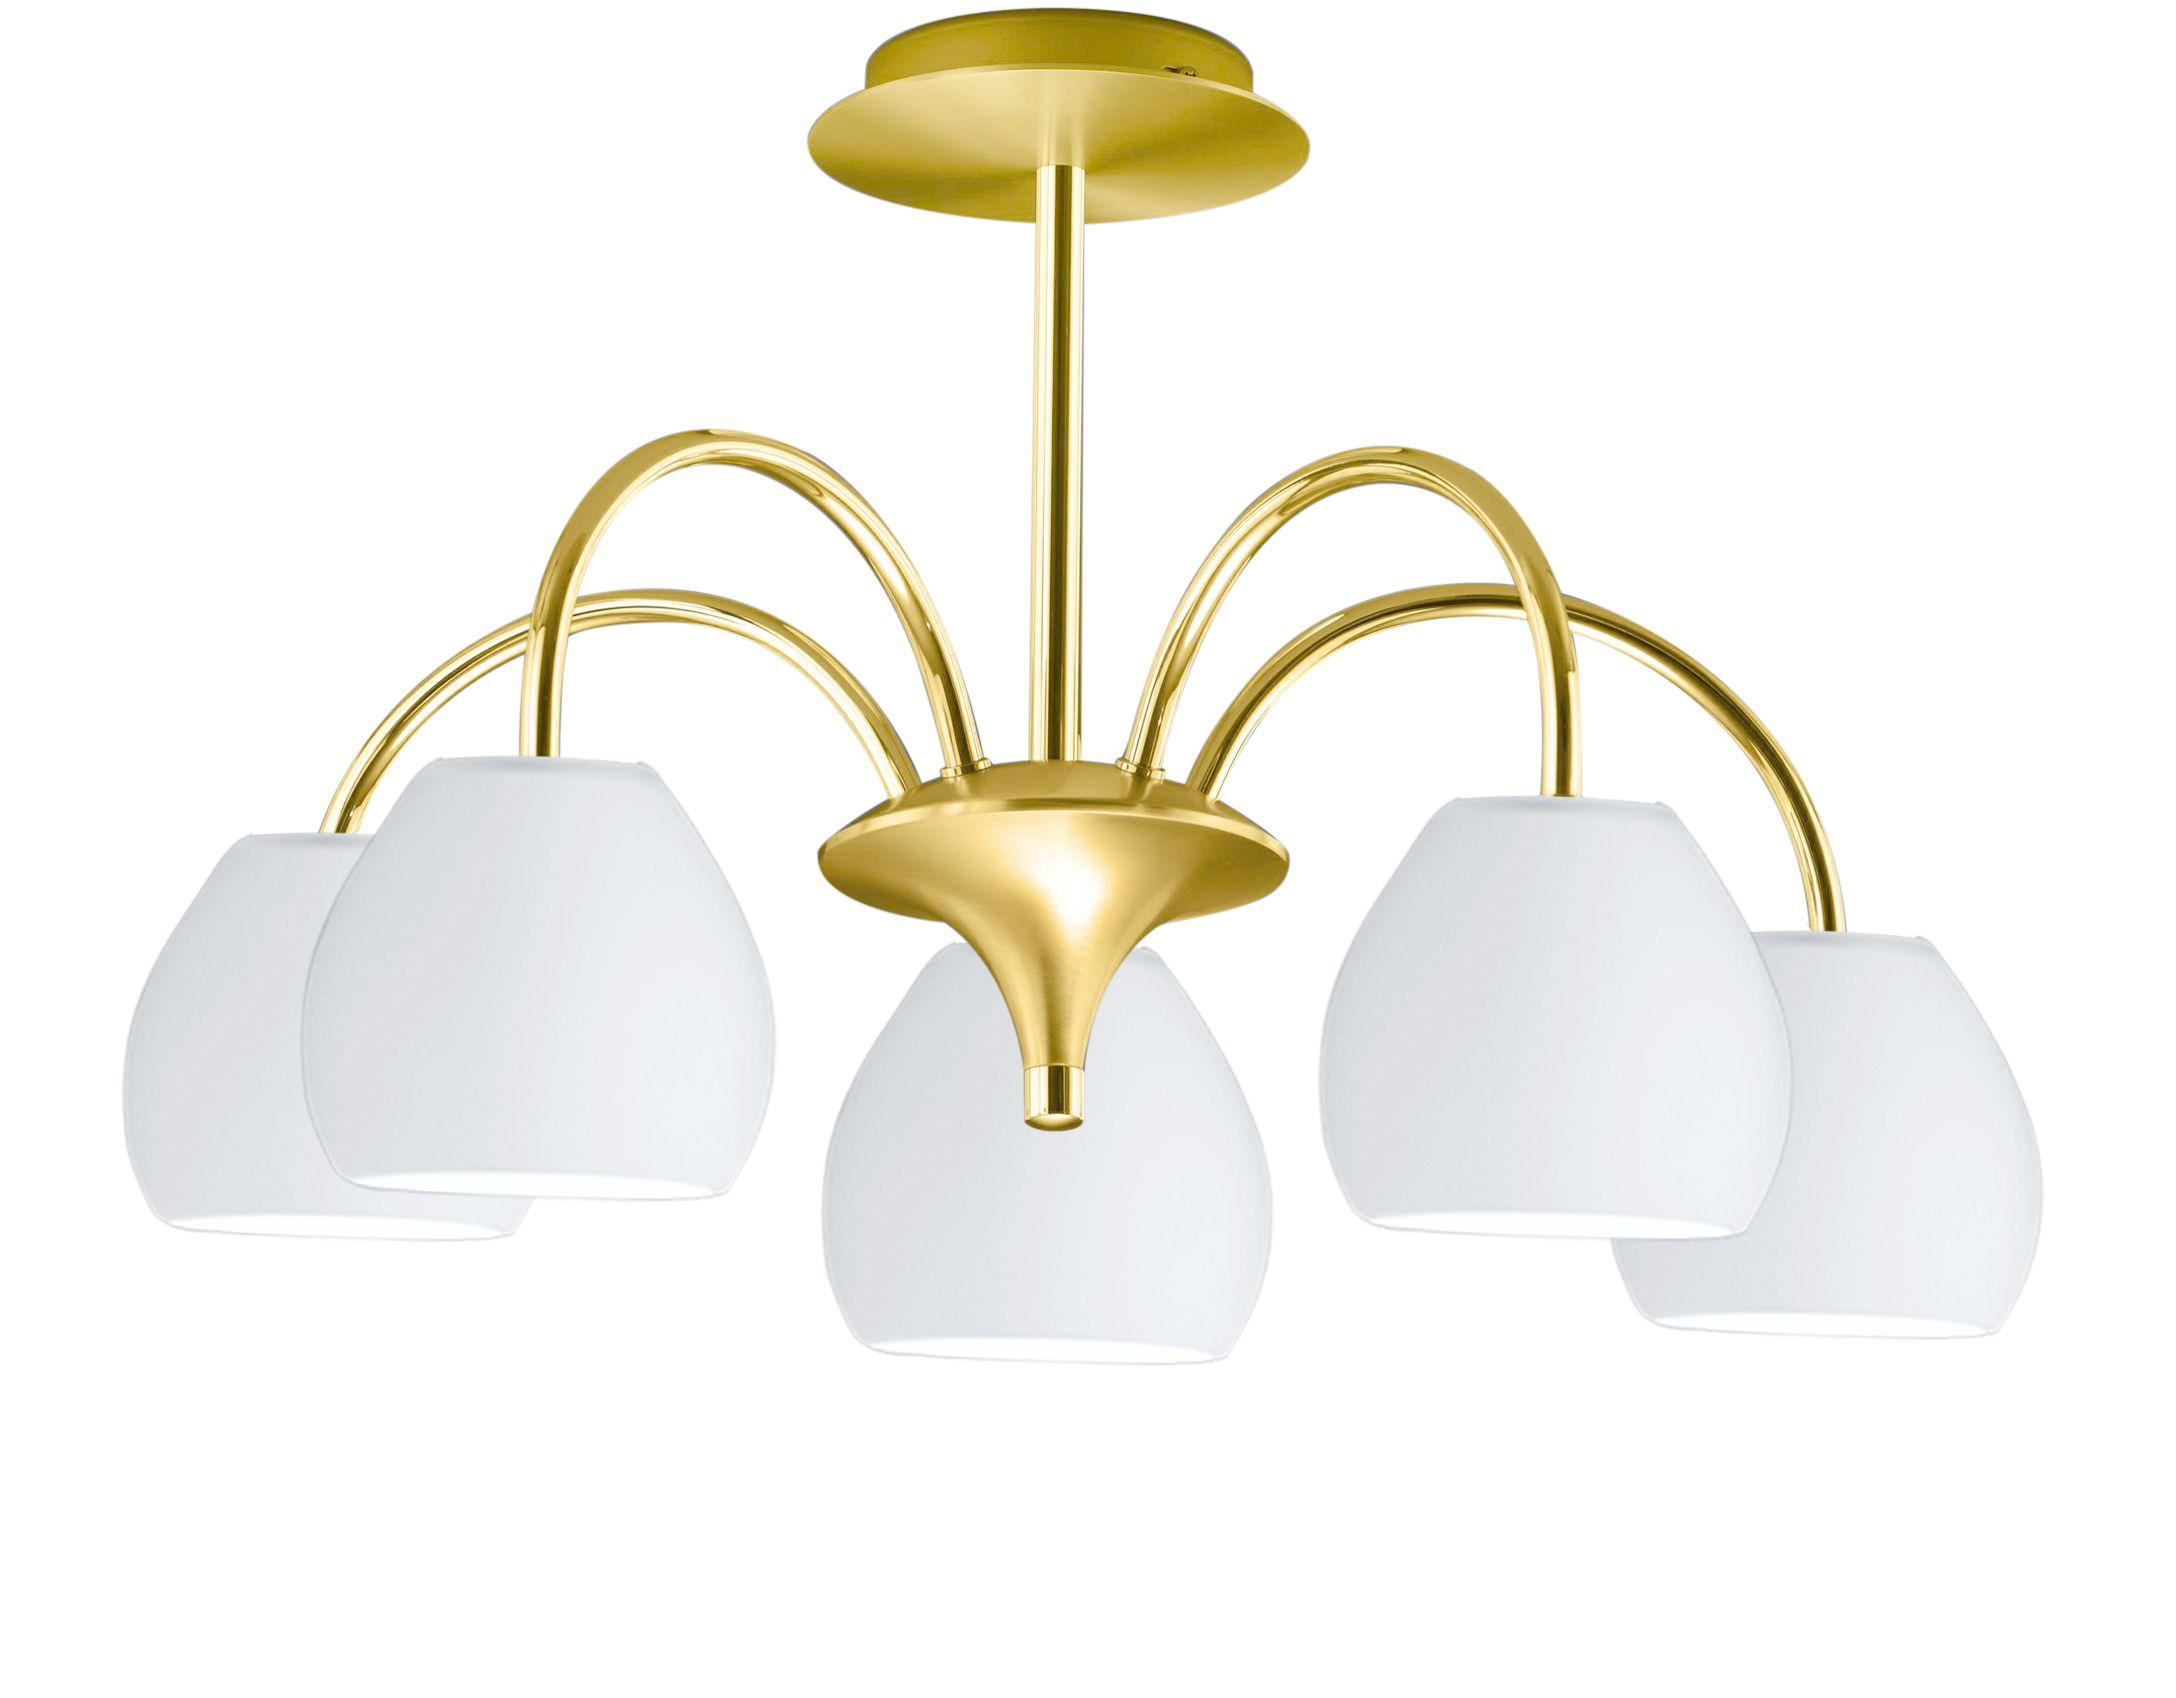 CENTURION Plafondlamp LED 5x Goud